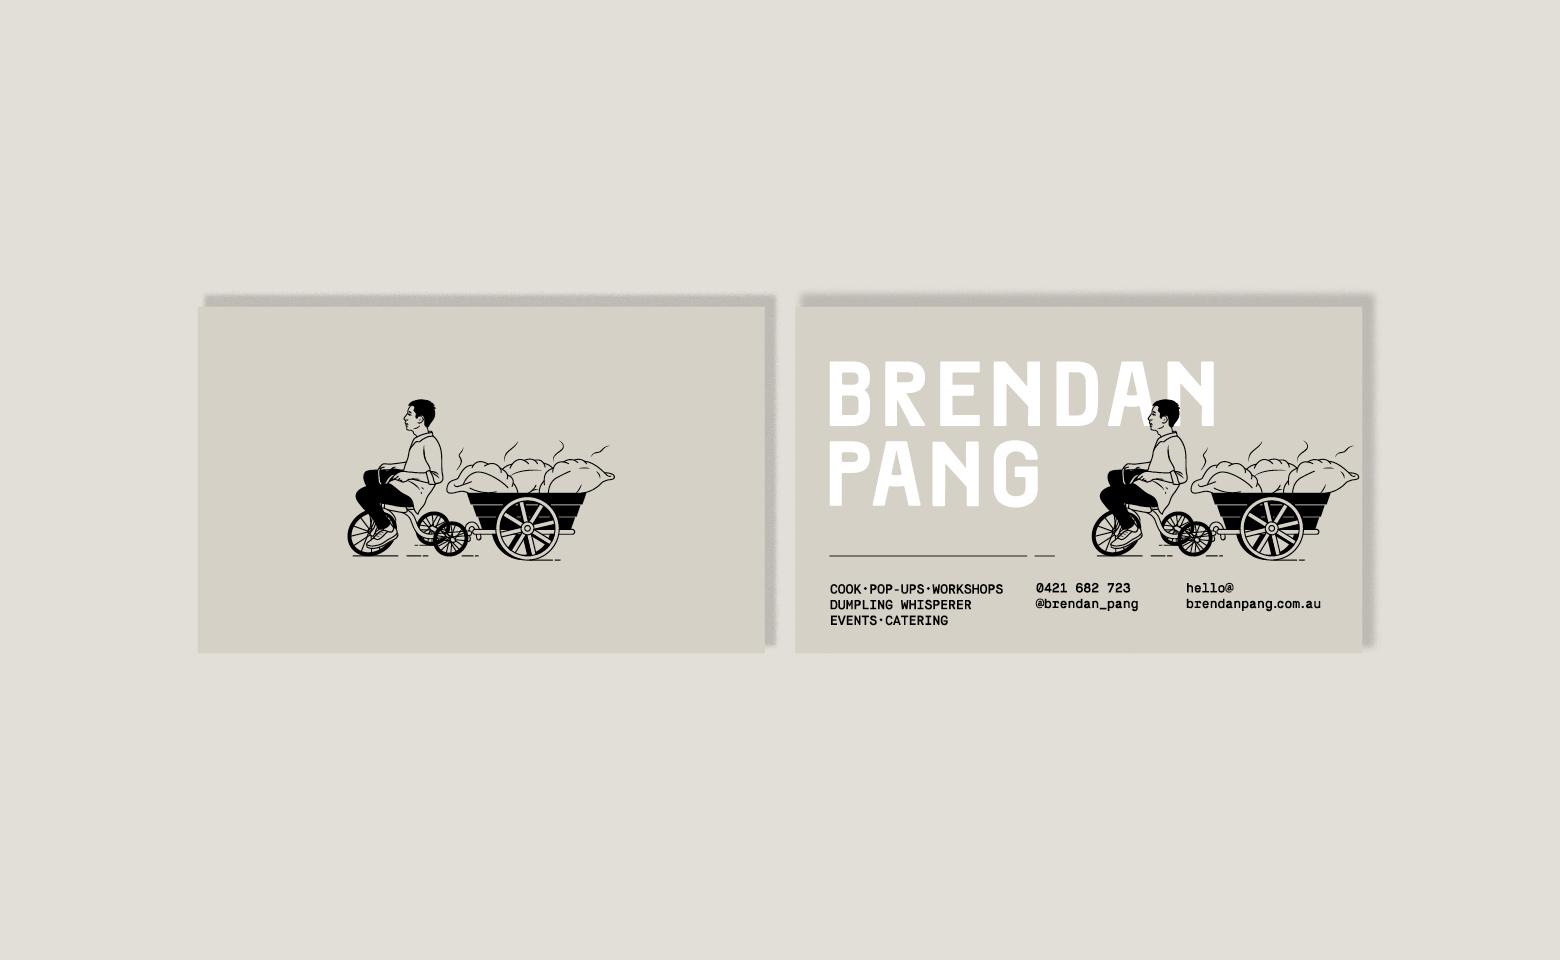 RyanVincent_Web_BrendanPang4